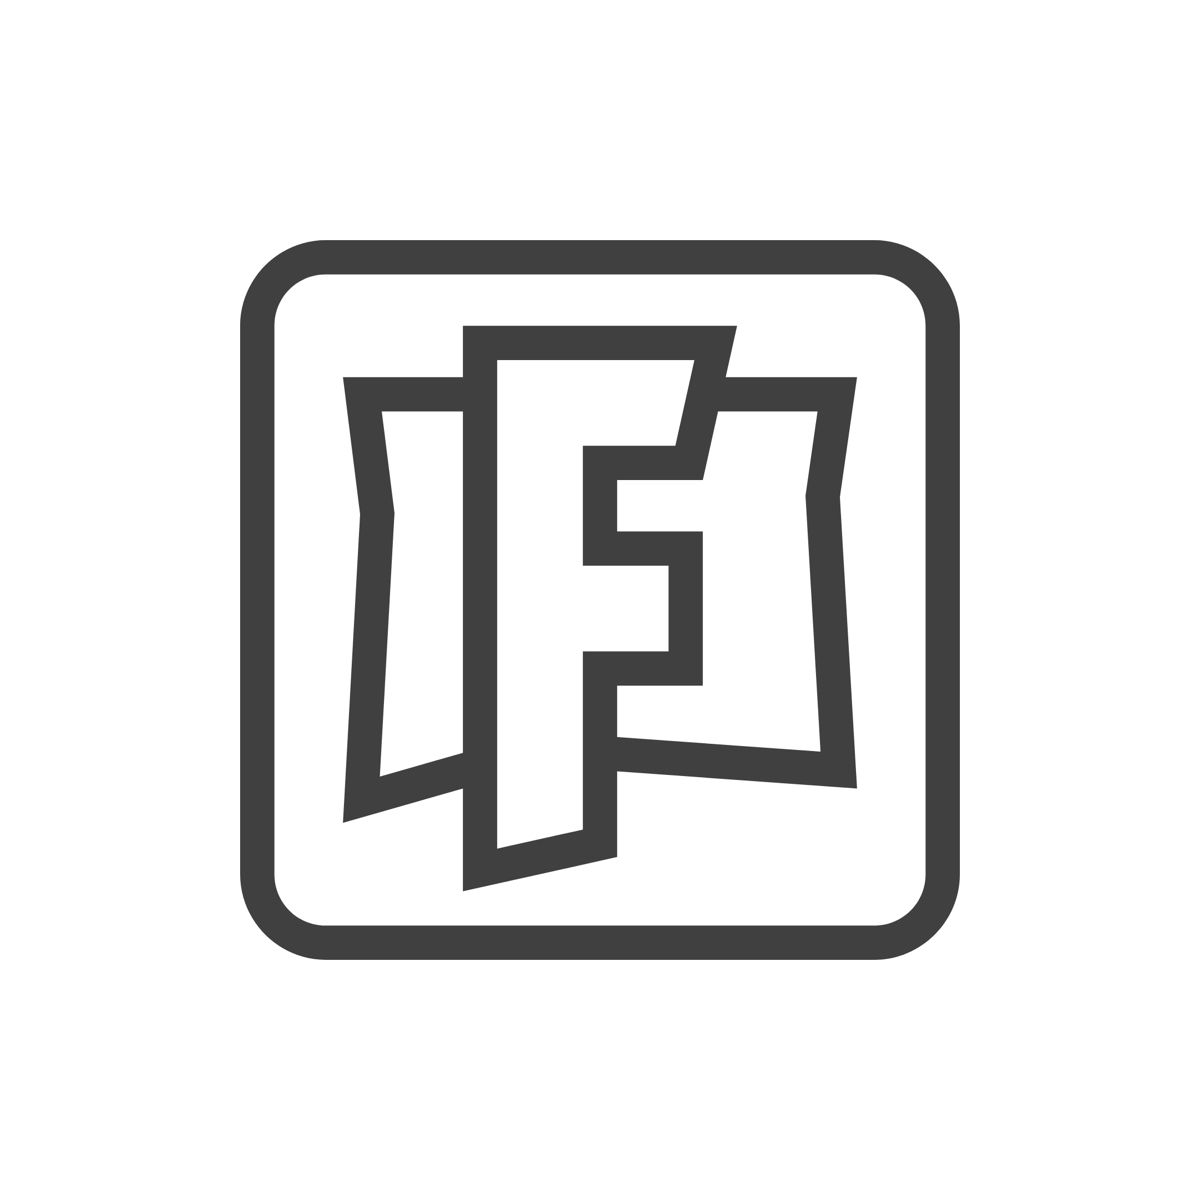 App Icon Fortnite App Icon App Icon